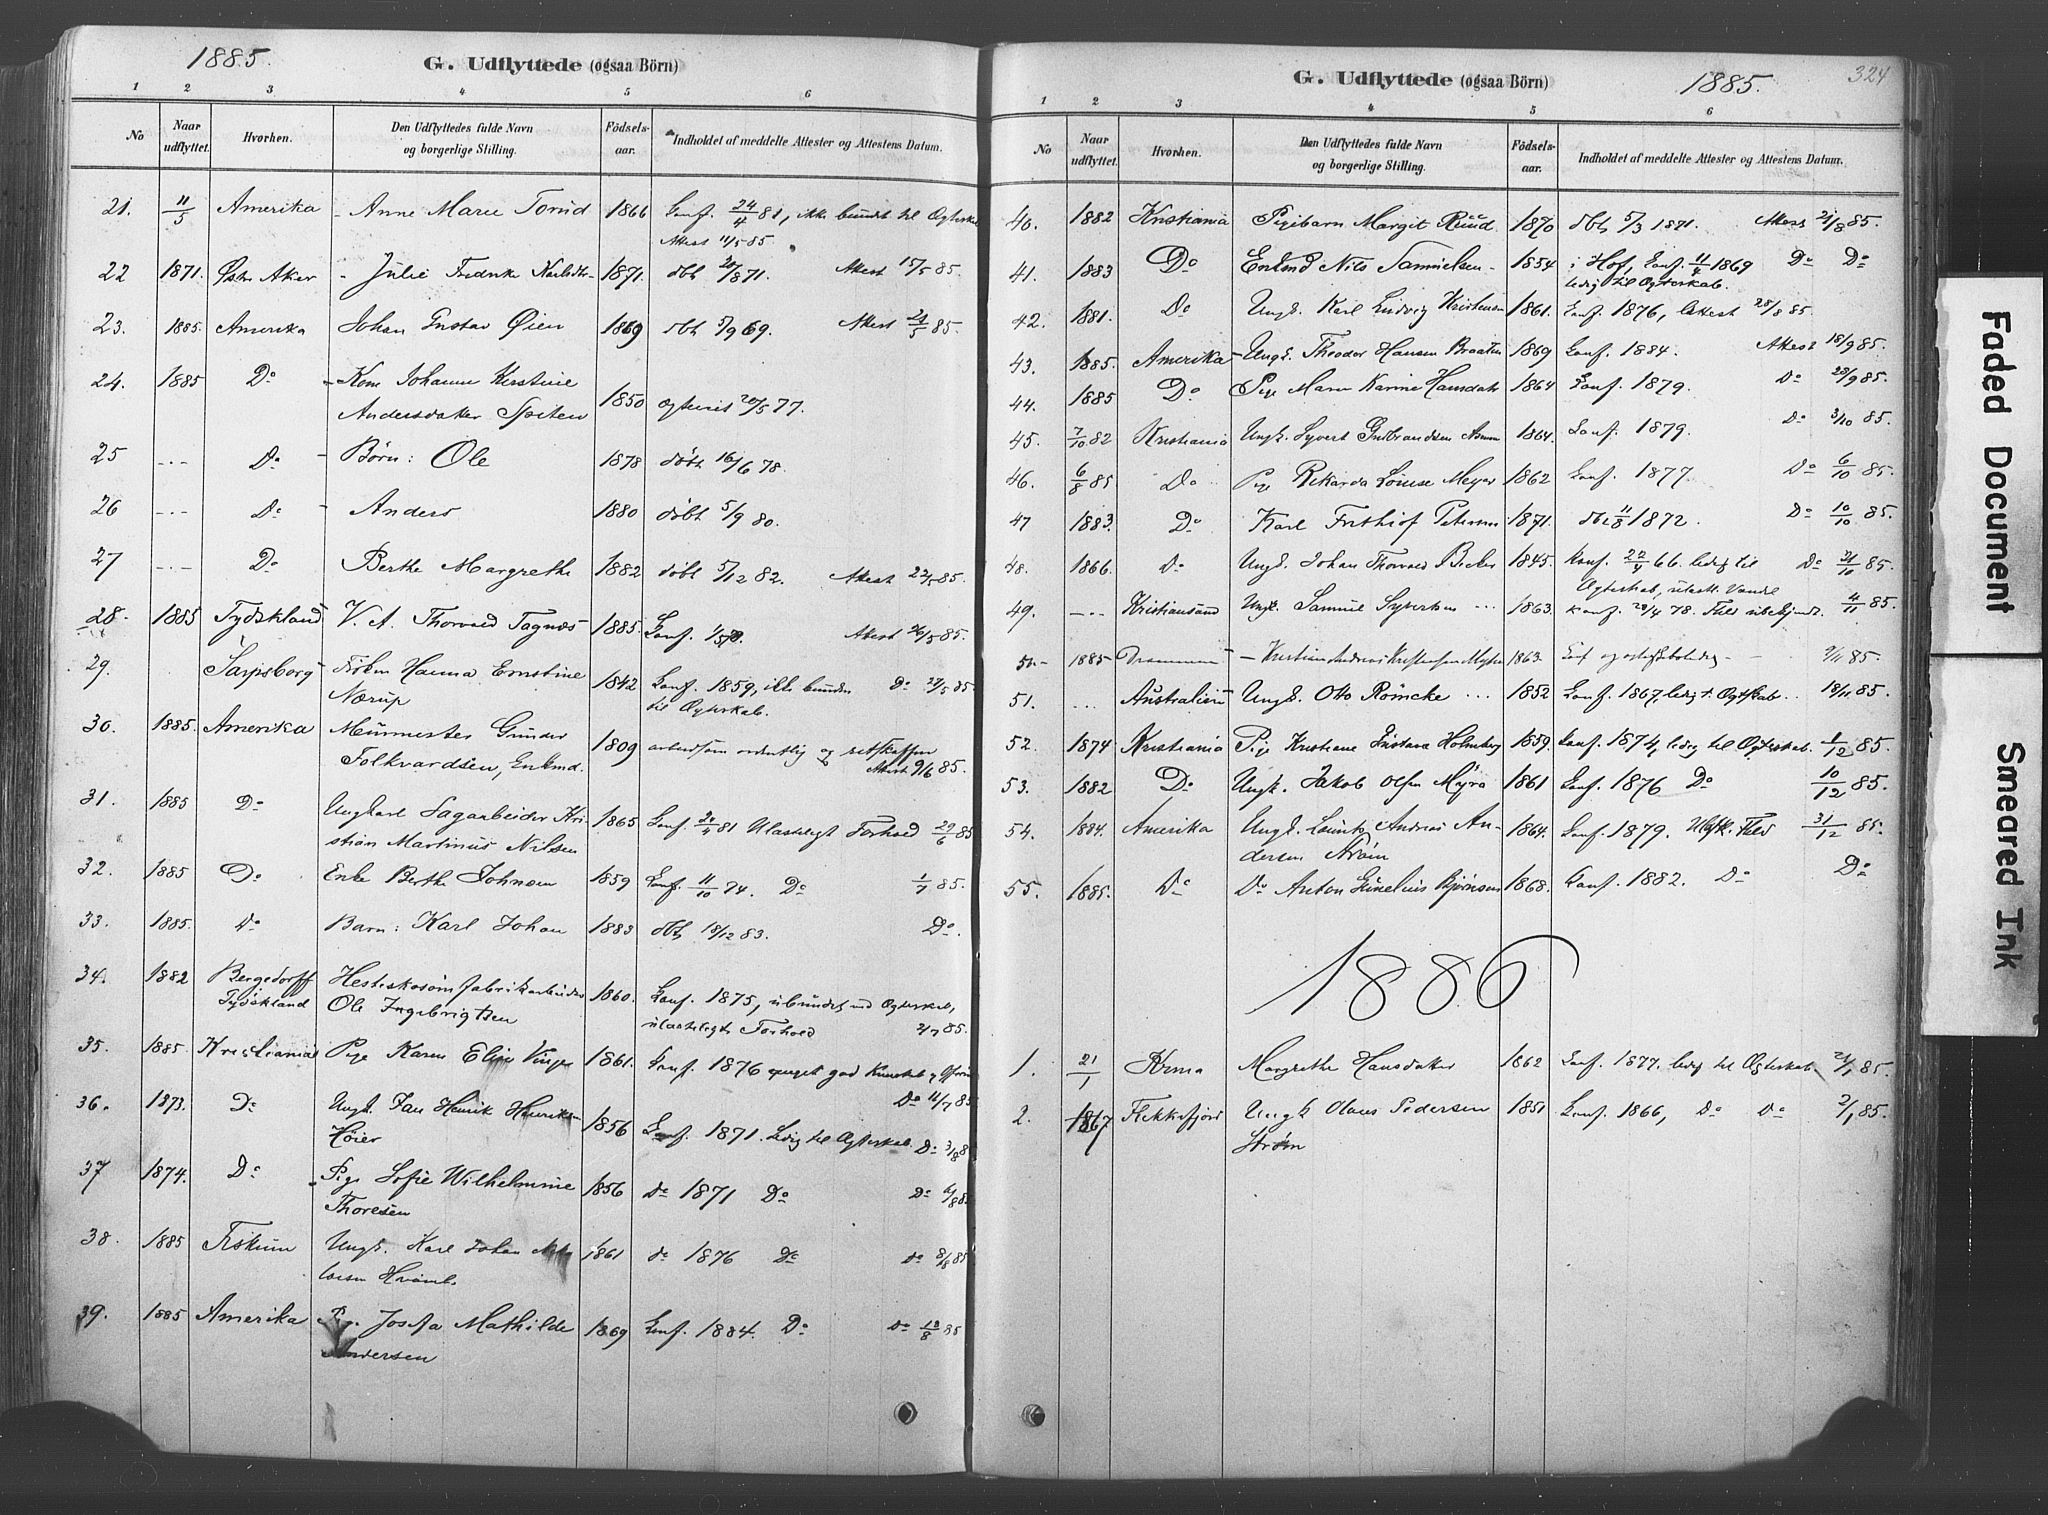 SAKO, Kongsberg kirkebøker, F/Fb/L0001: Ministerialbok nr. II 1, 1878-1886, s. 324